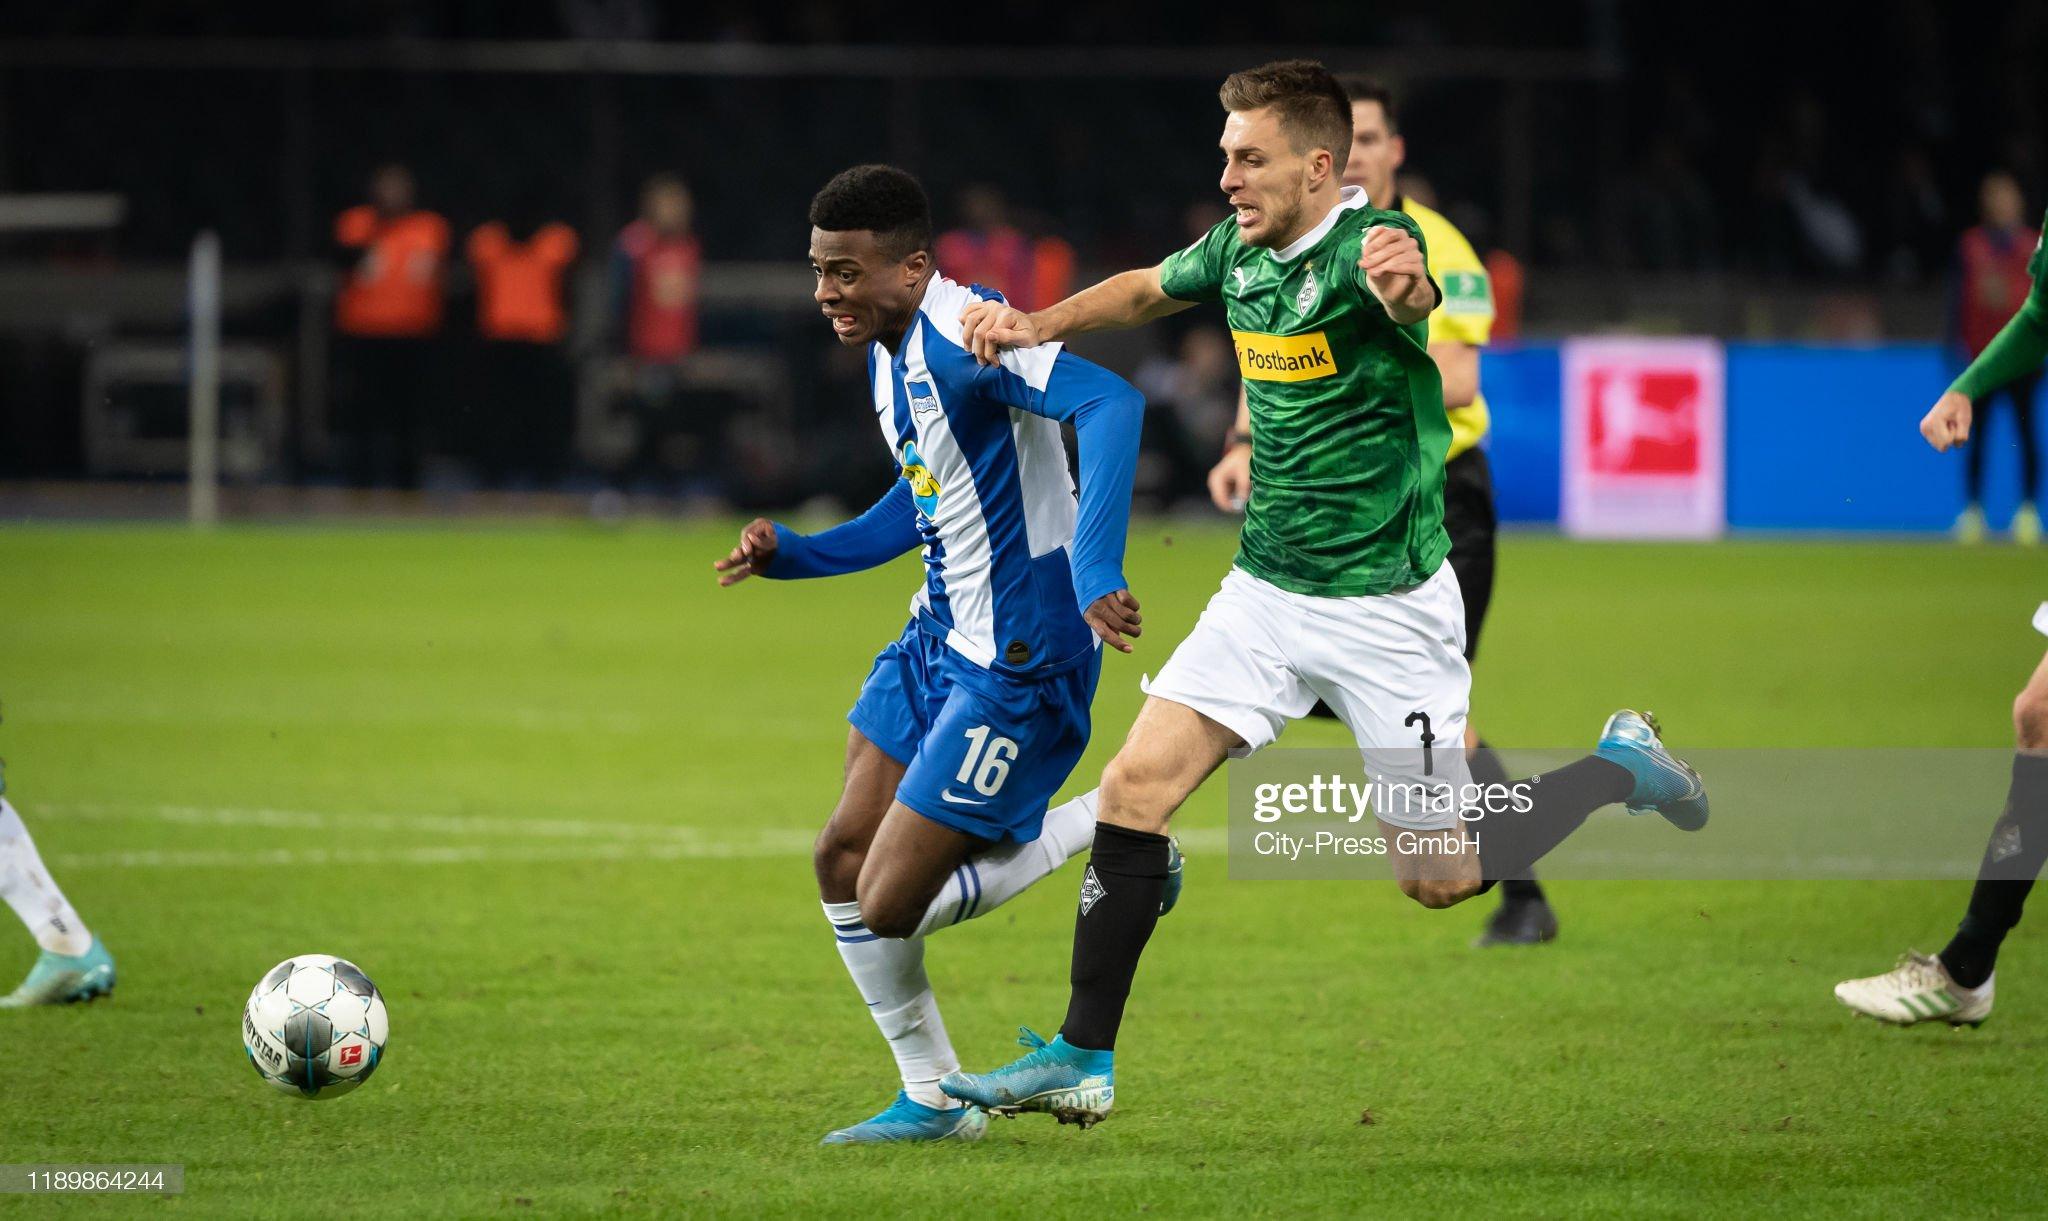 Monchengladbach vs Hertha Berlin Preview, prediction and odds